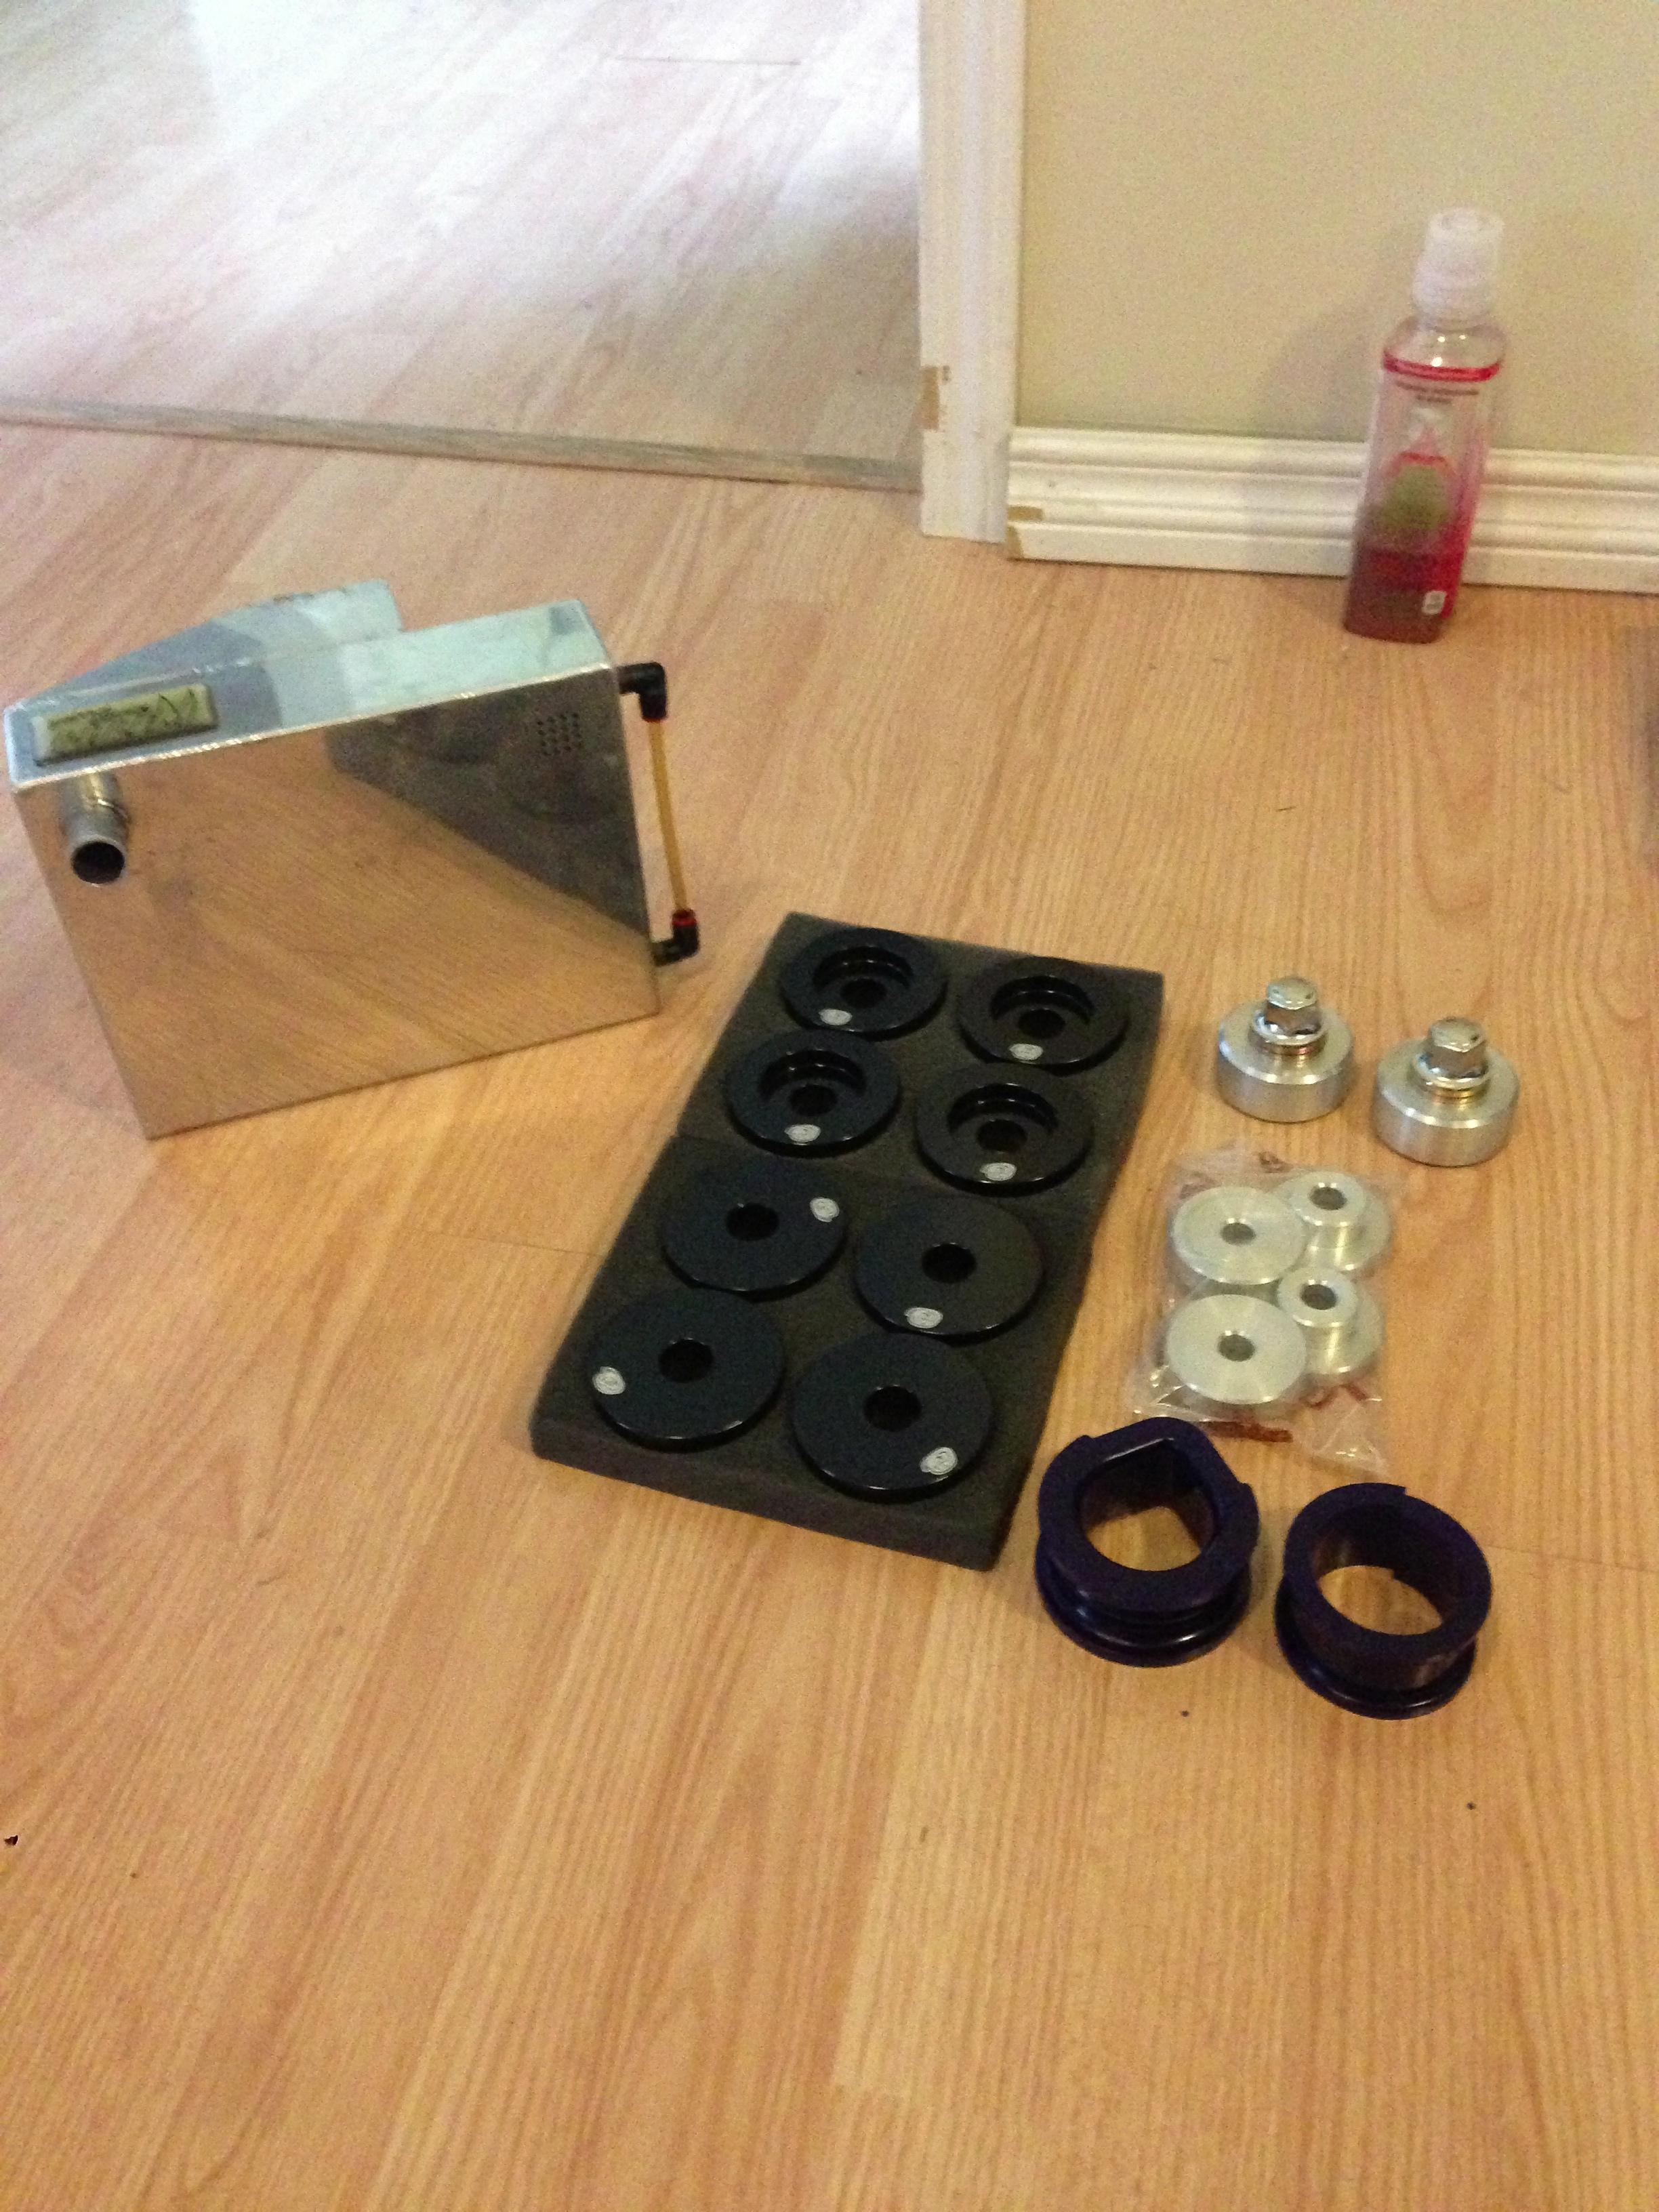 90 240sx Fuse Box Cover Ask Answer Wiring Diagram 89 S13 M2 Elsalvadorla Fuel Pump